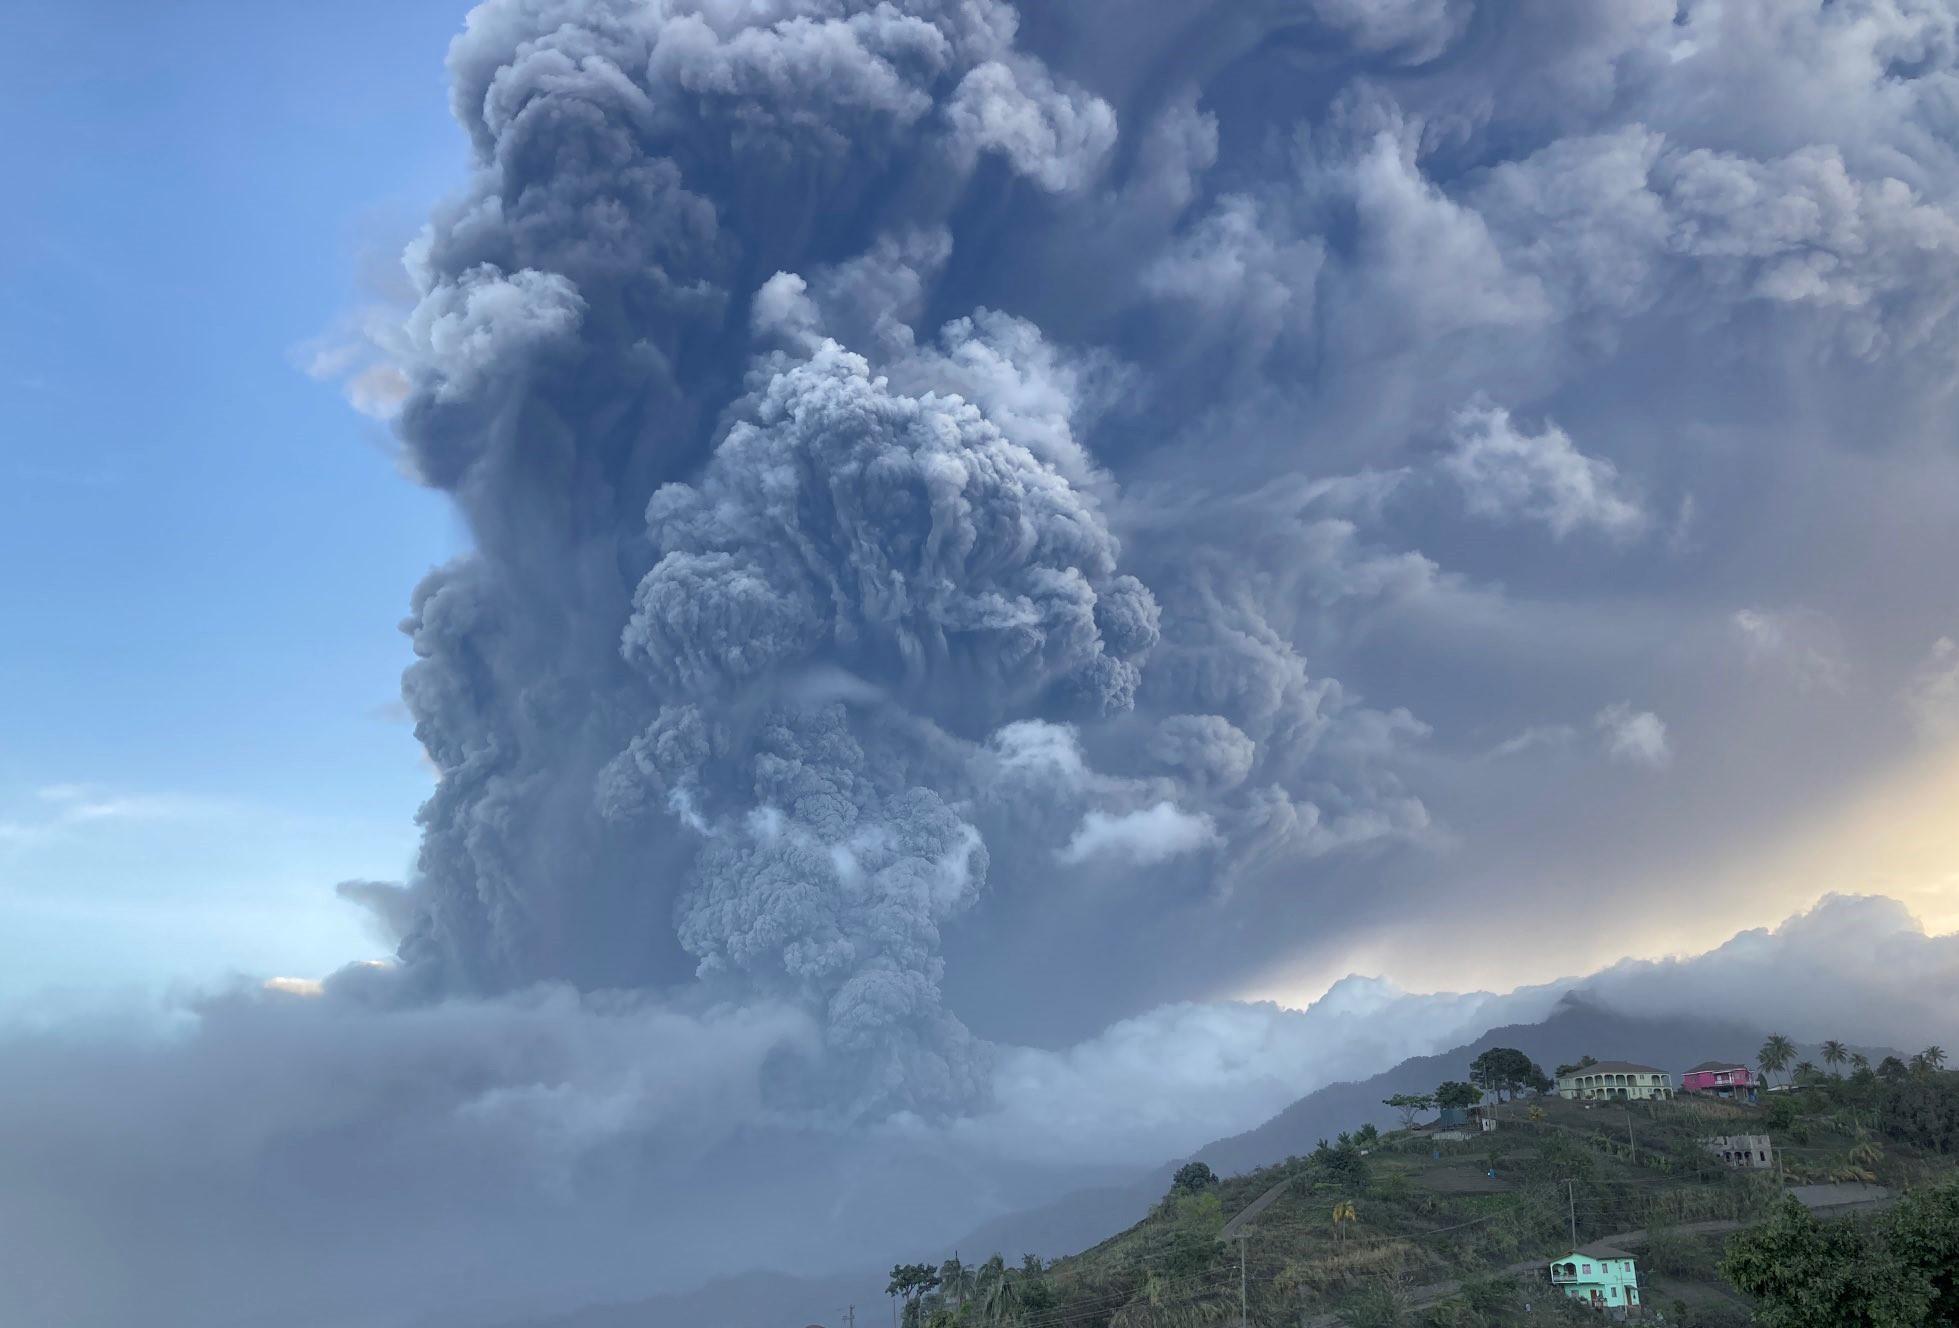 La Soufriere Volcano Eruption on the Island of St. Vincent